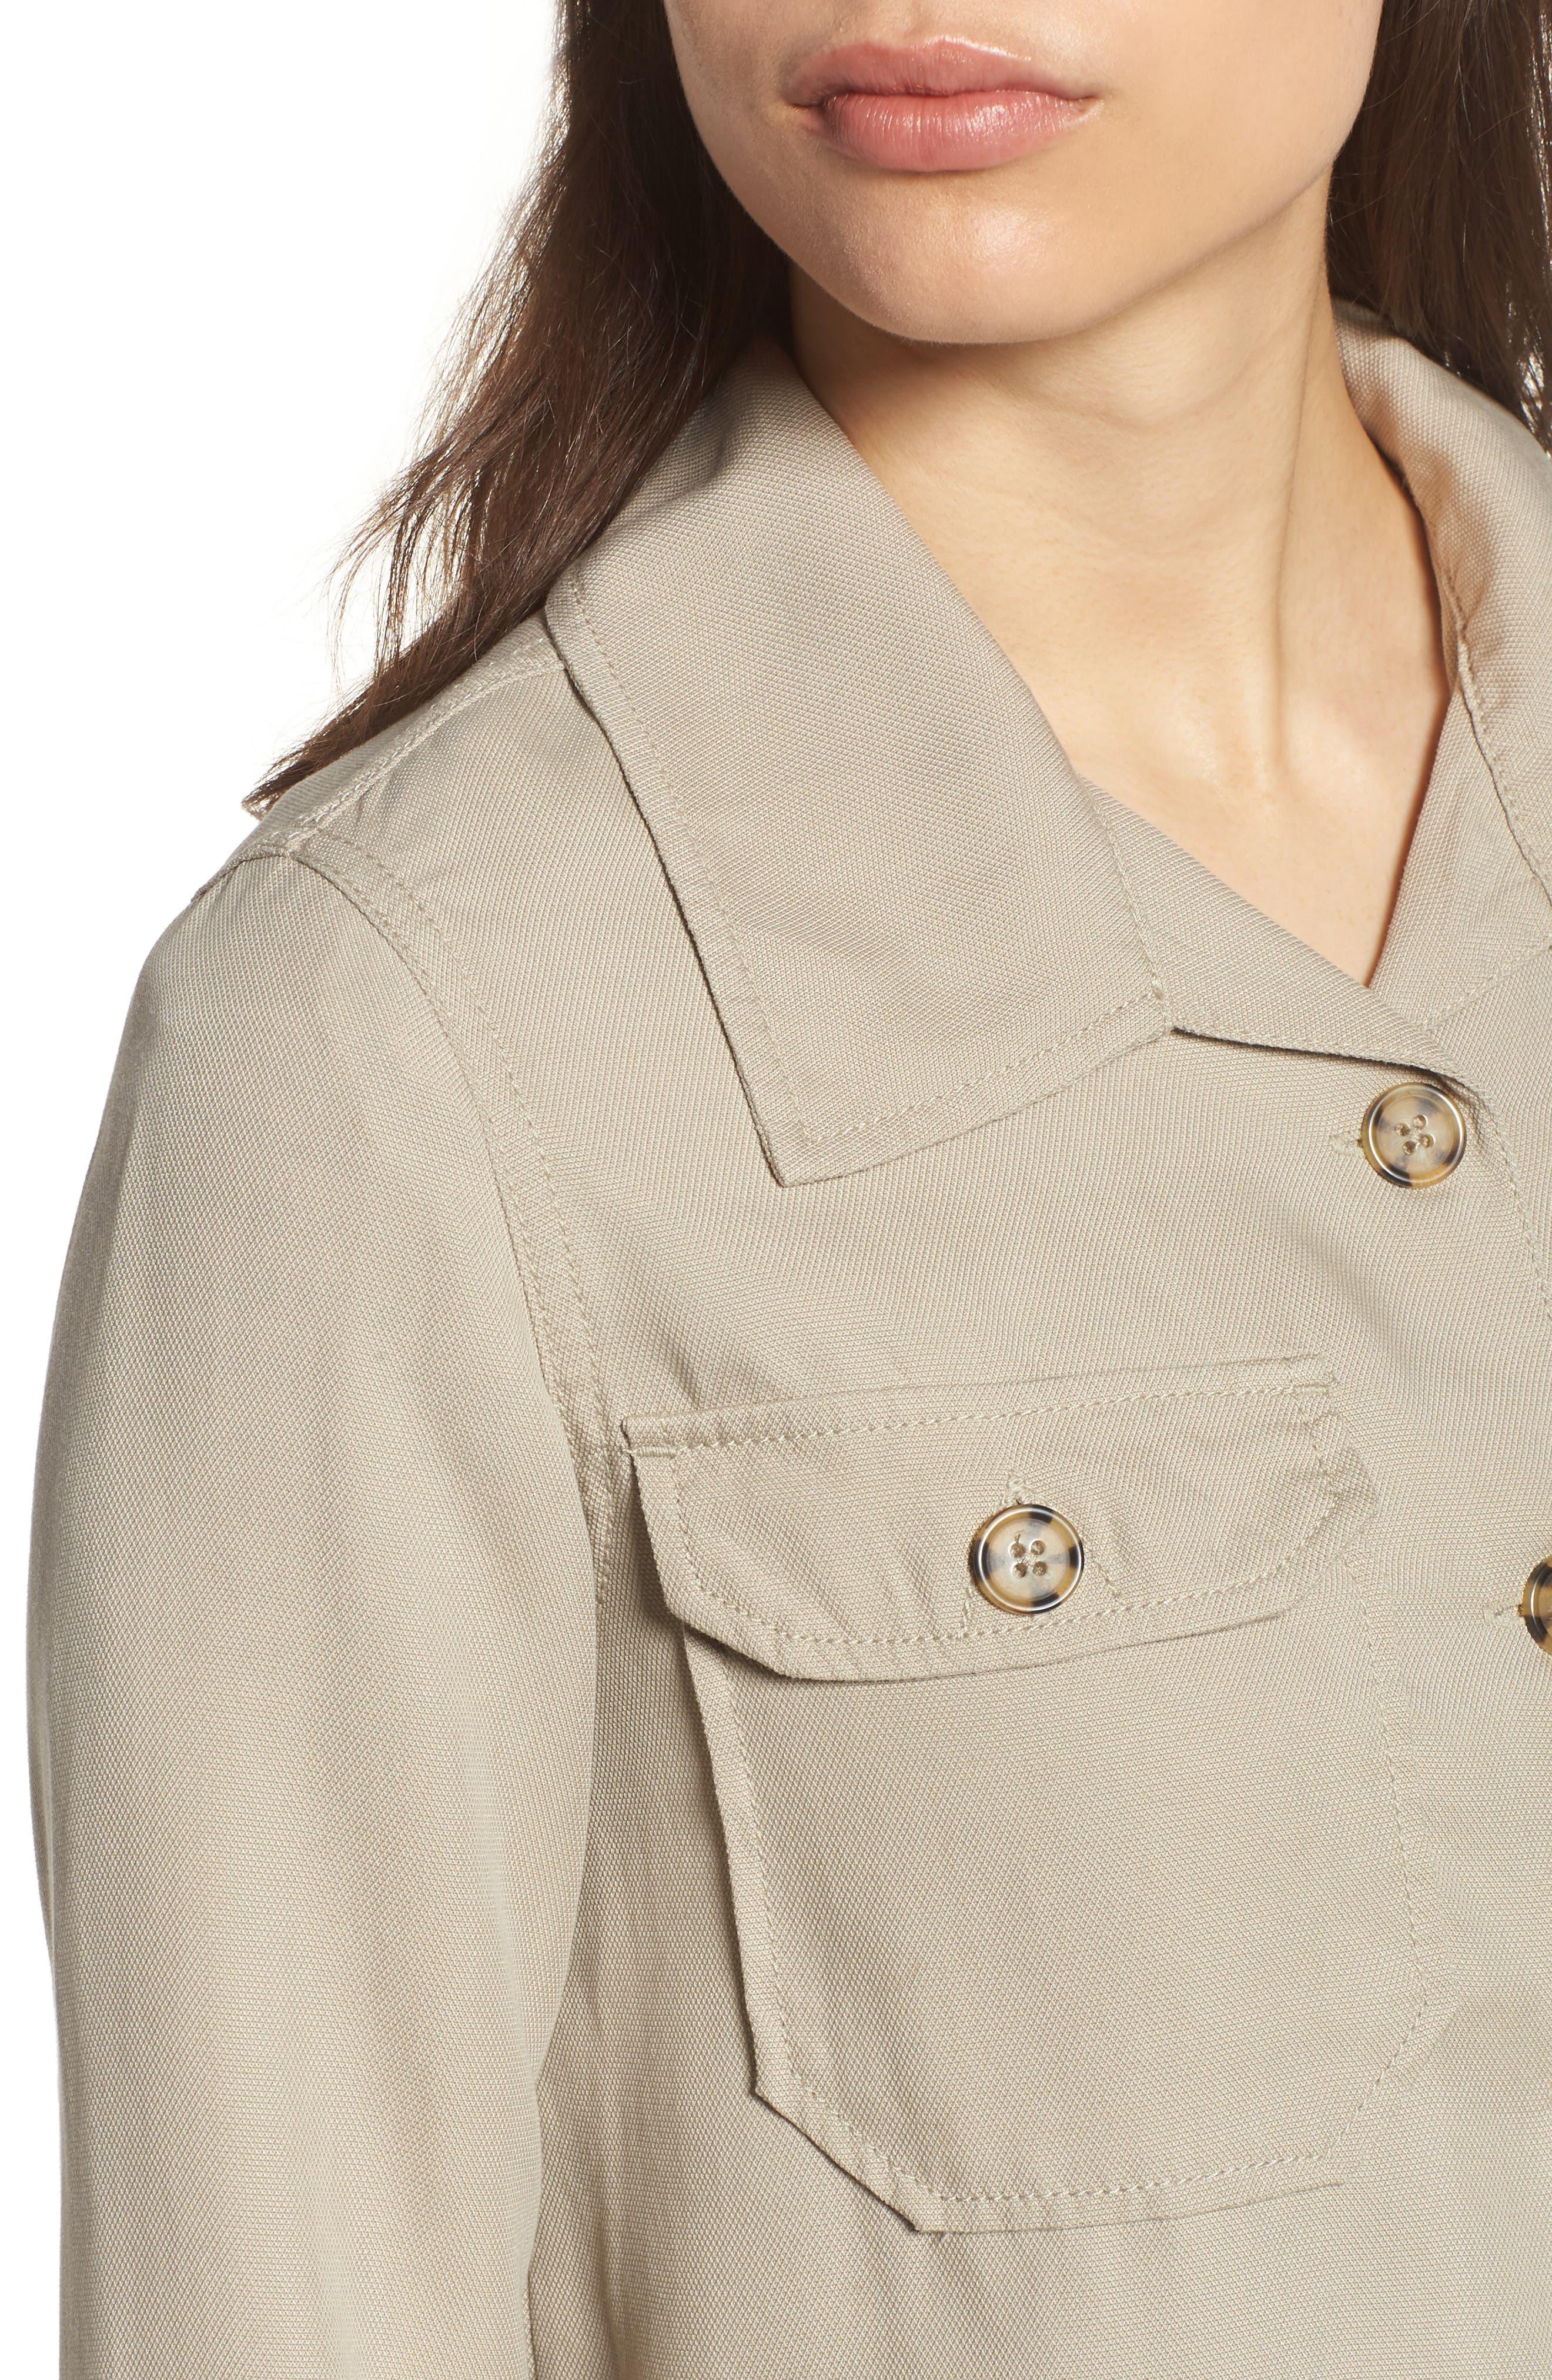 Flyaway Shirt Jacket,                             Alternate thumbnail 4, color,                             Chateau Gray